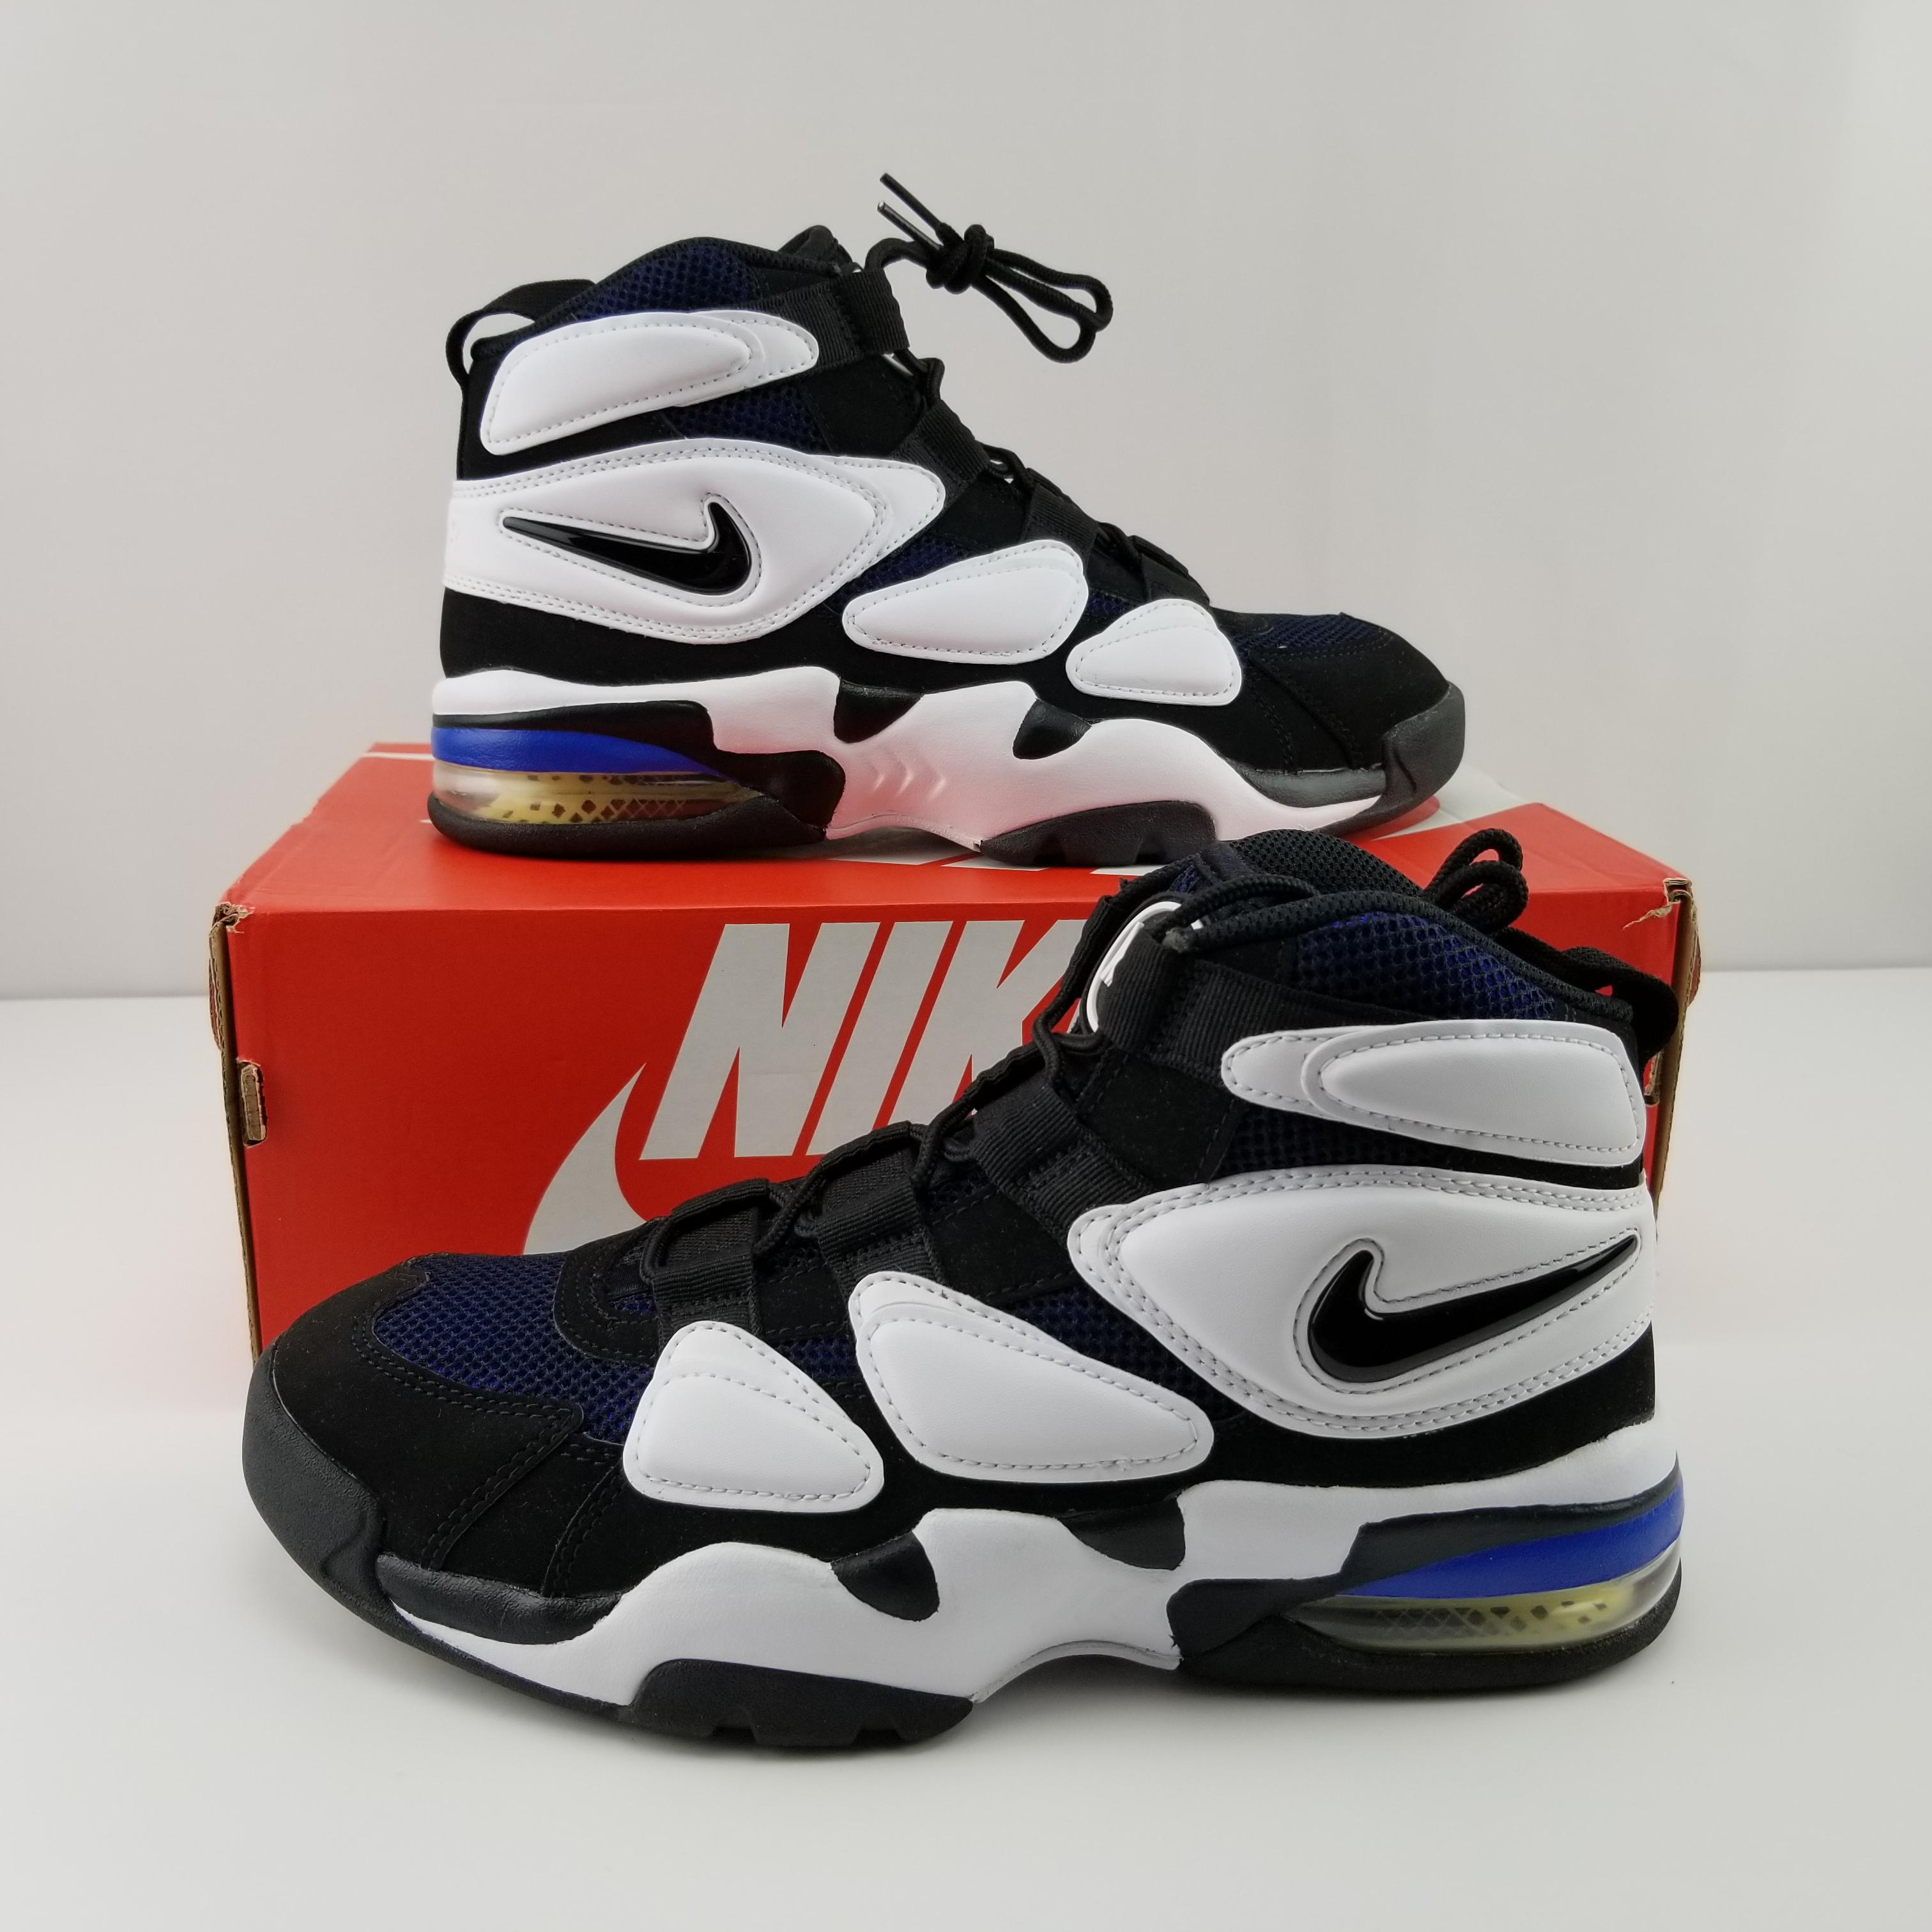 Nike Air Max 2 Uptempo 94 Duke Retro | HYPEBEAST